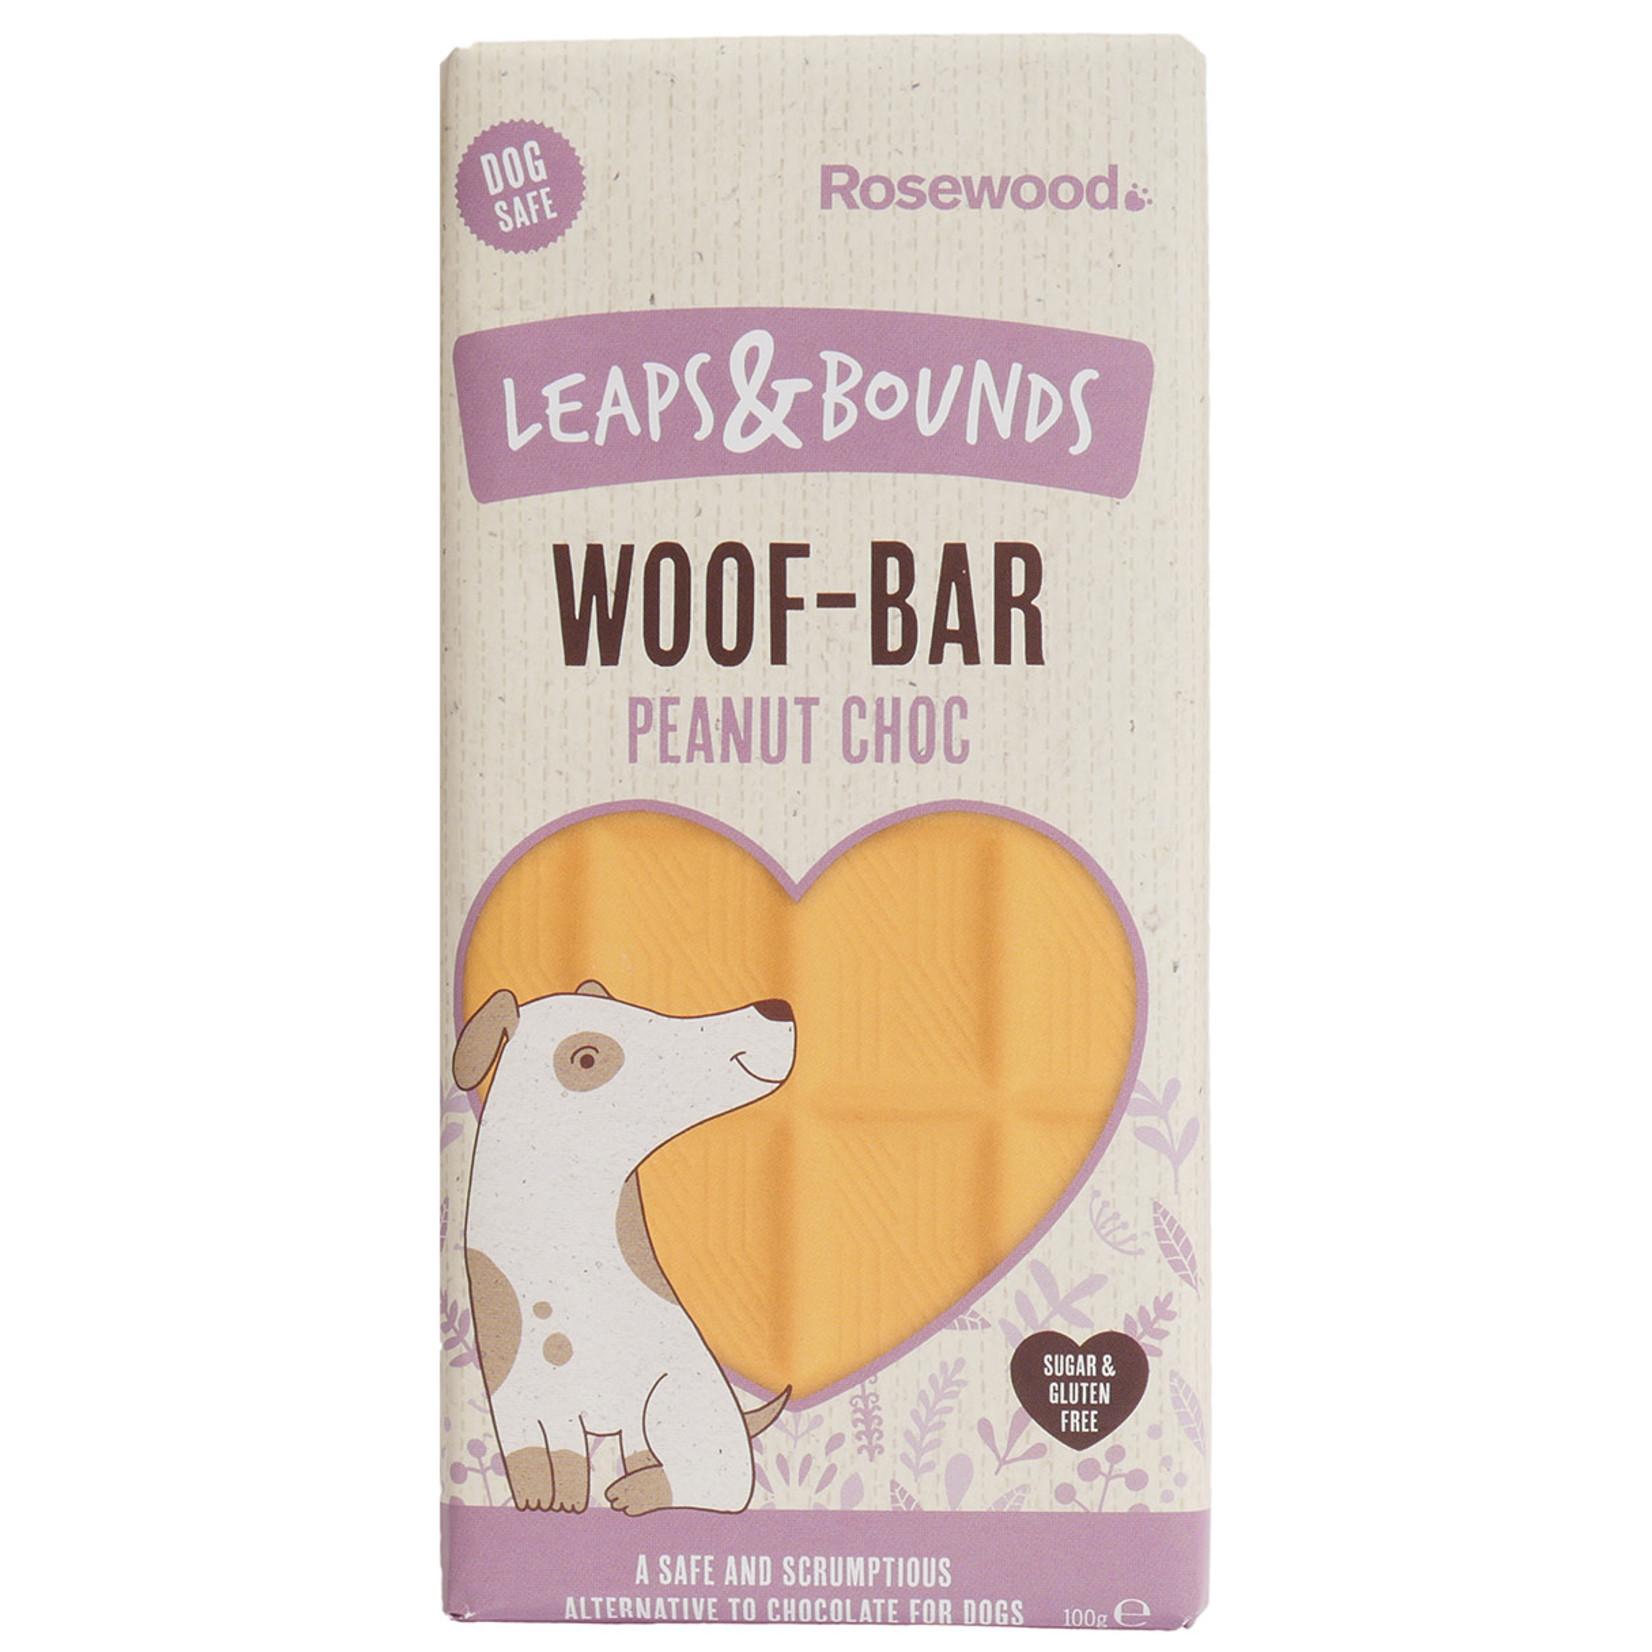 Rosewood Leaps & Bounds Woof Peanut Chocolate Bar Dog Treat, 100g